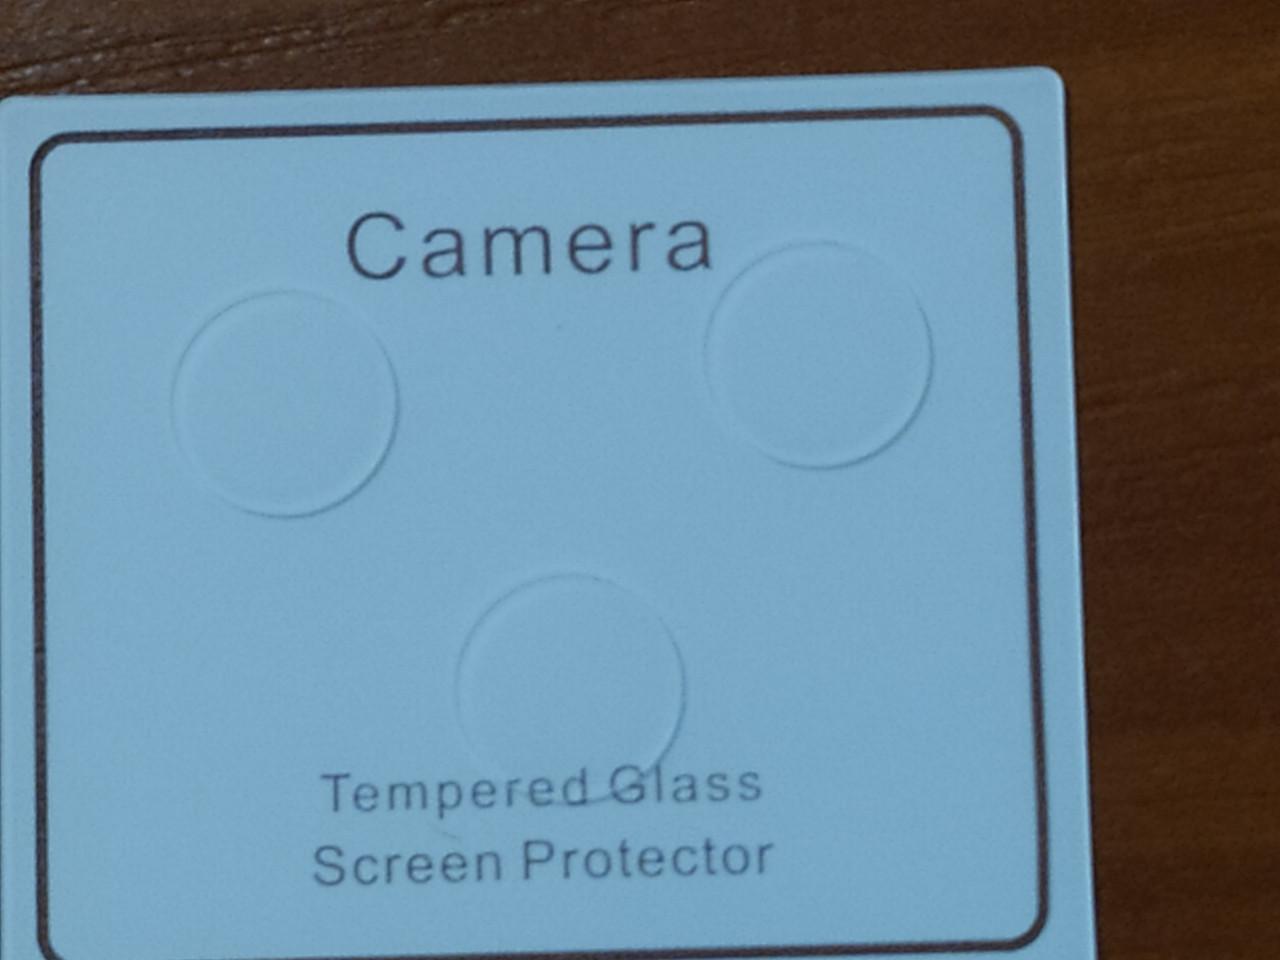 Защитное стекло на камеру Tempered Glass Screen Protector    iPhone 11 Pro  Max    2019